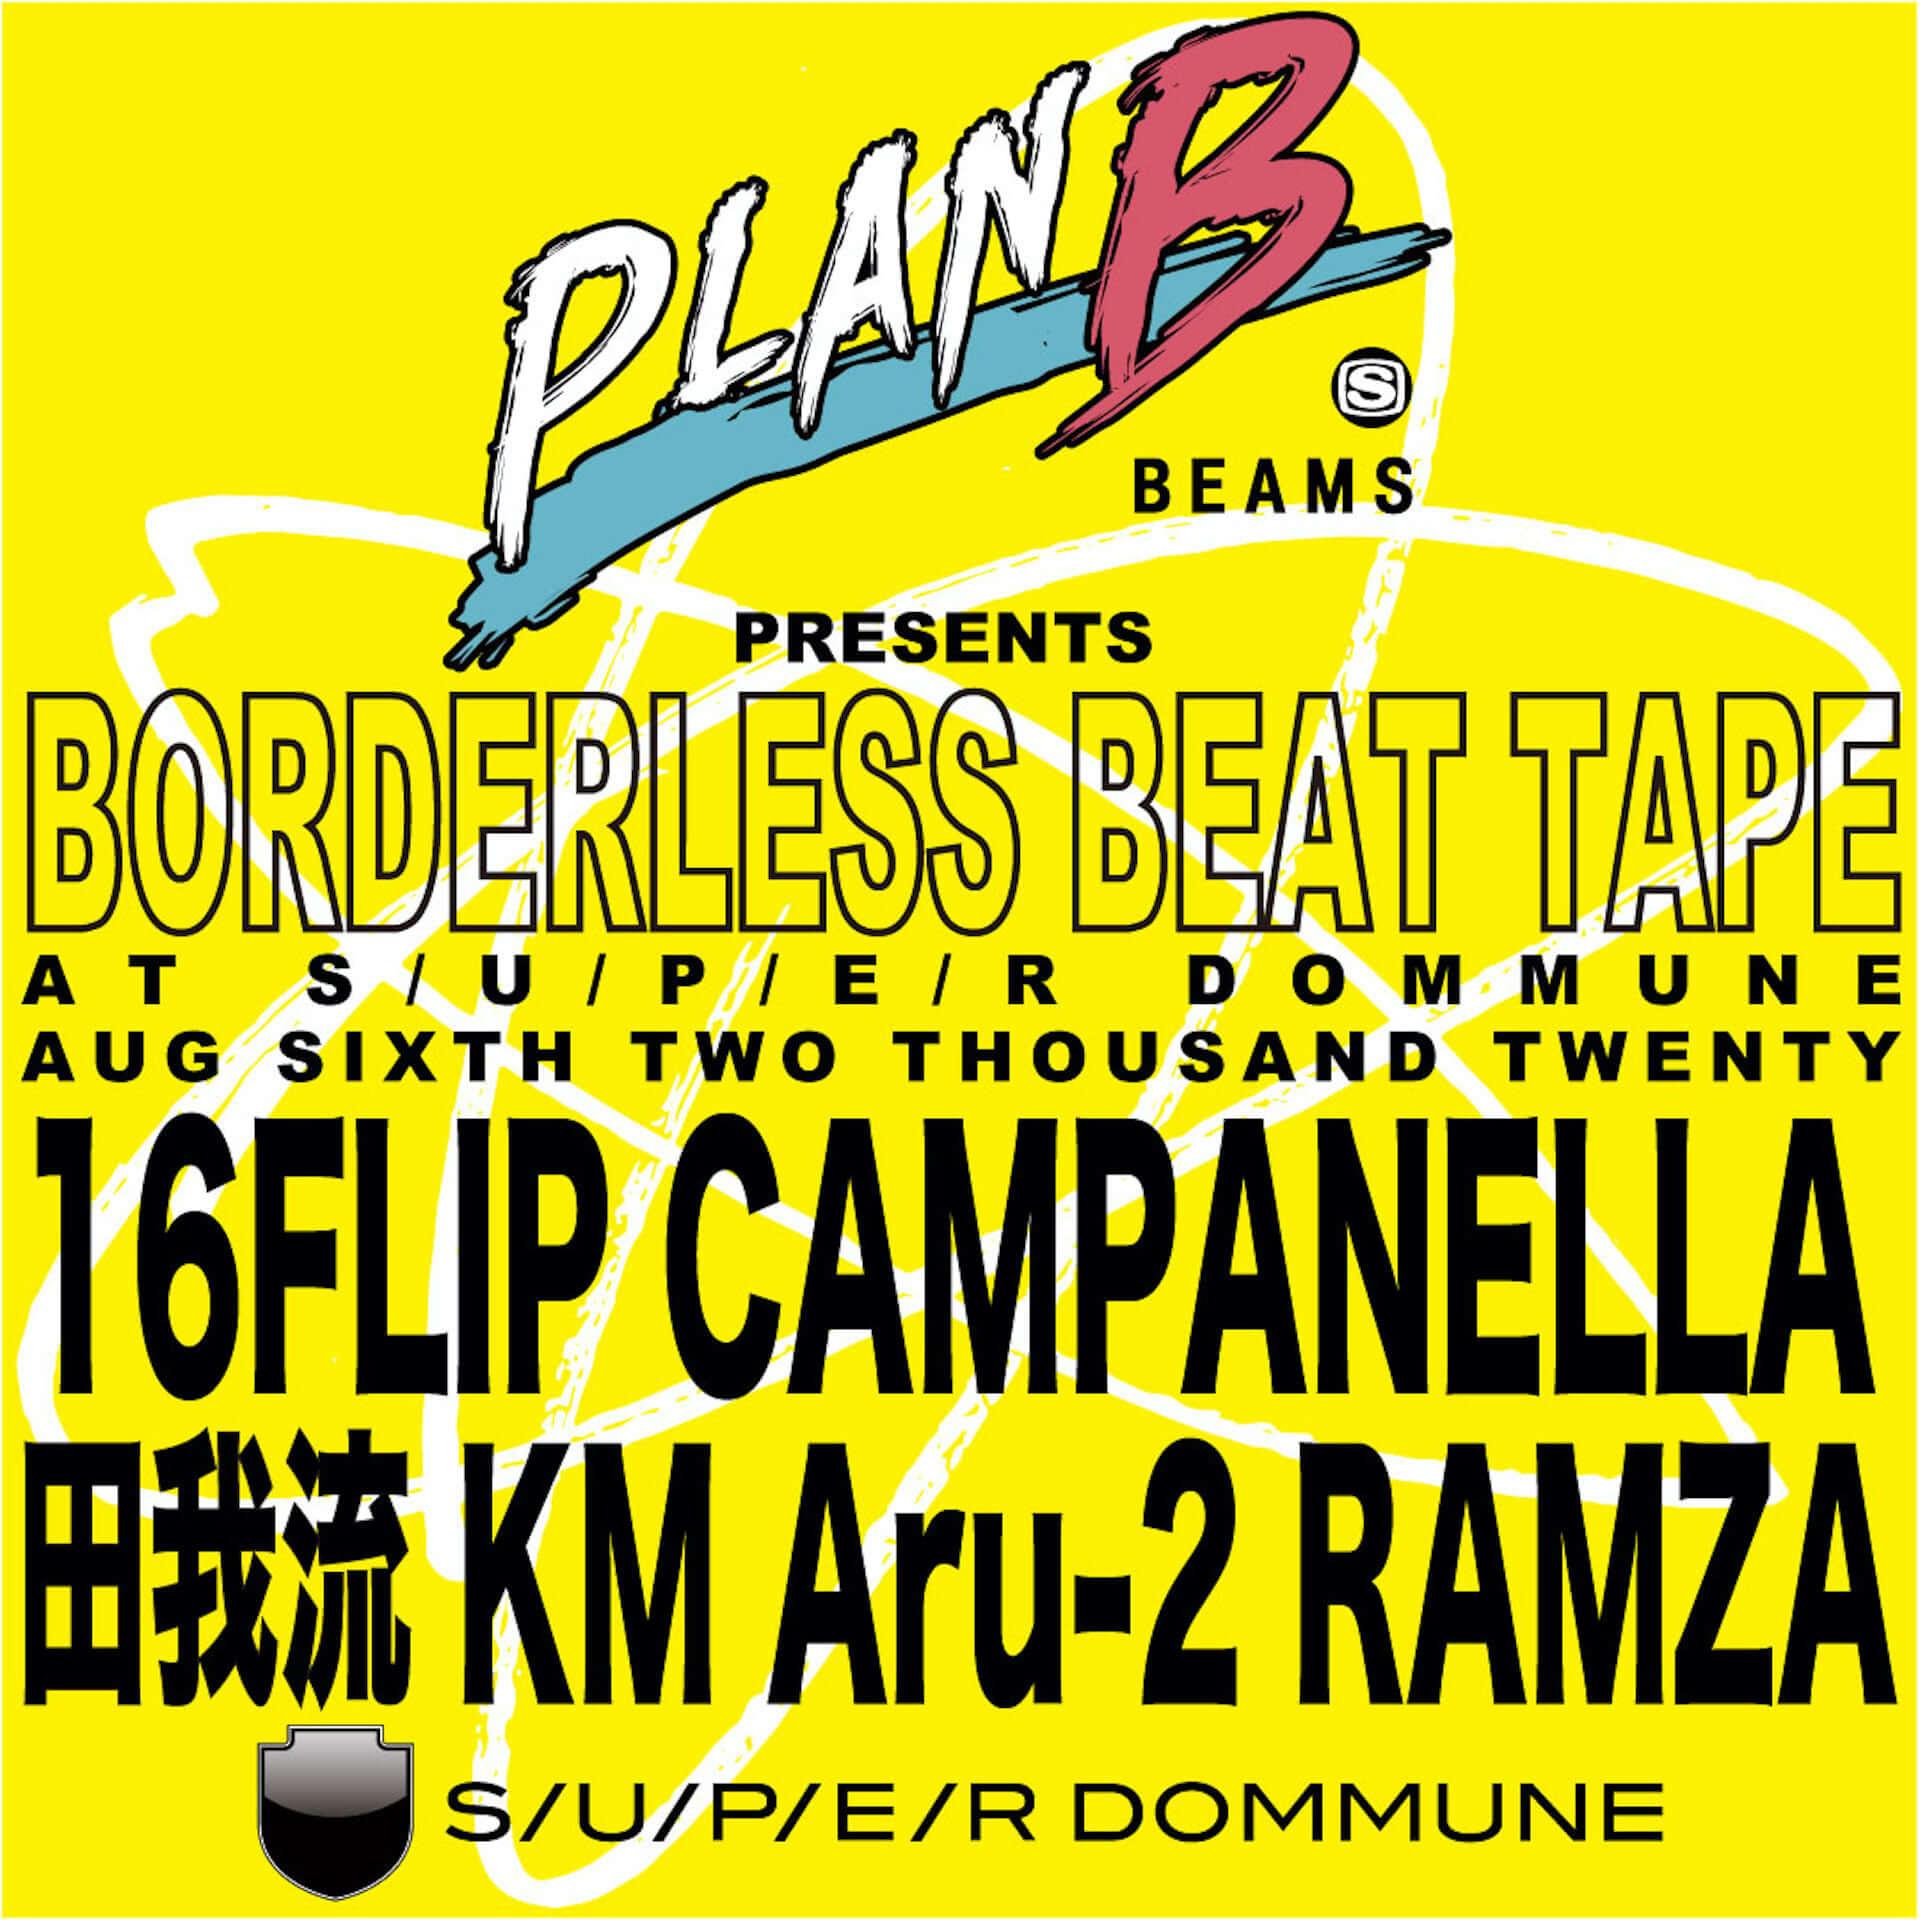 BEAMSとスペシャの共同プログラム「PLAN B」がSUPER DOMMUNEより無料ライブ配信決定!田我流、Campanella、Aru-2ら出演 music200731_sstv-beams-planb_5-1920x1920